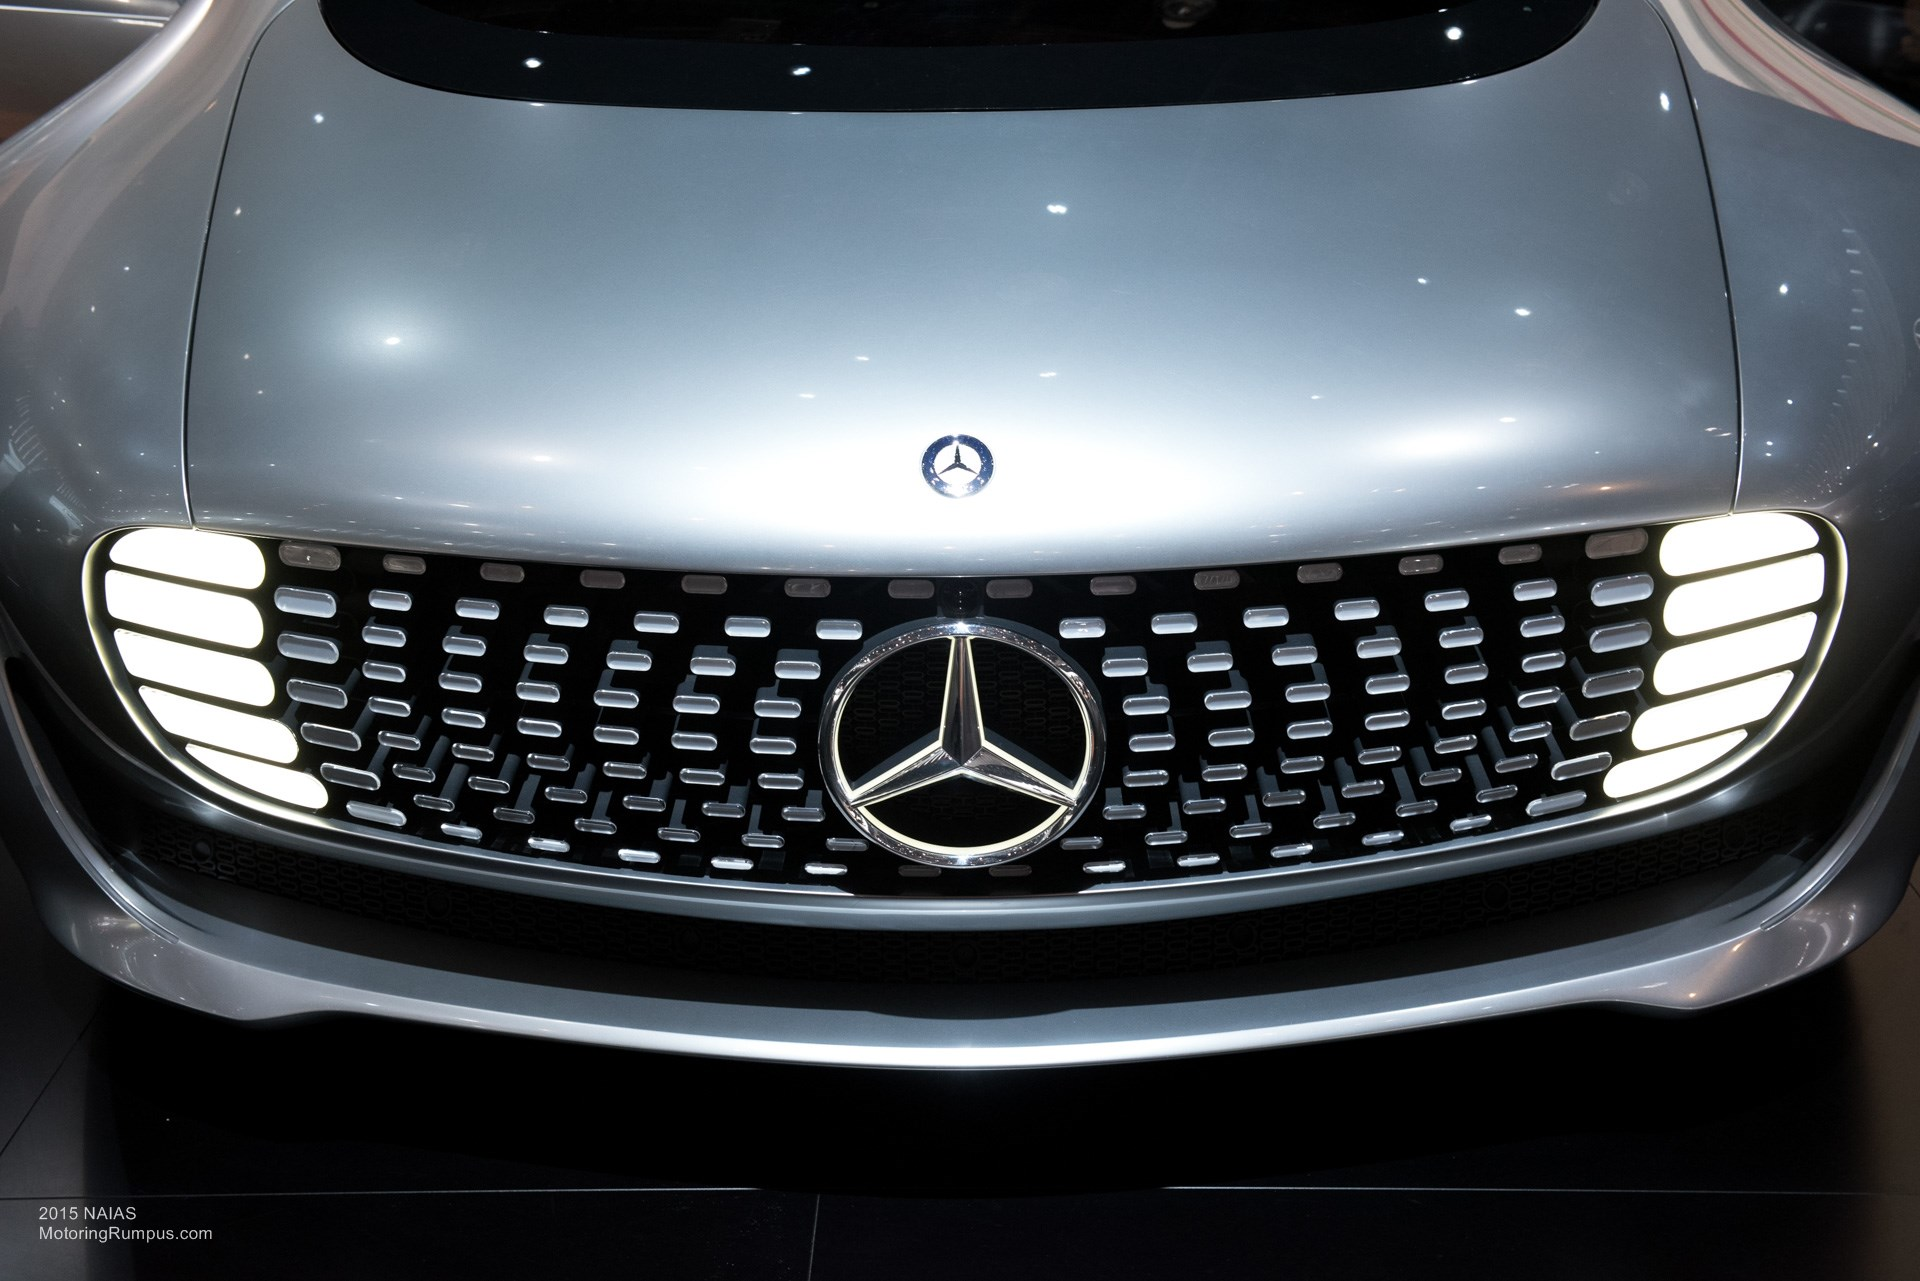 2015 NAIAS Mercedes-Benz F 015 Front